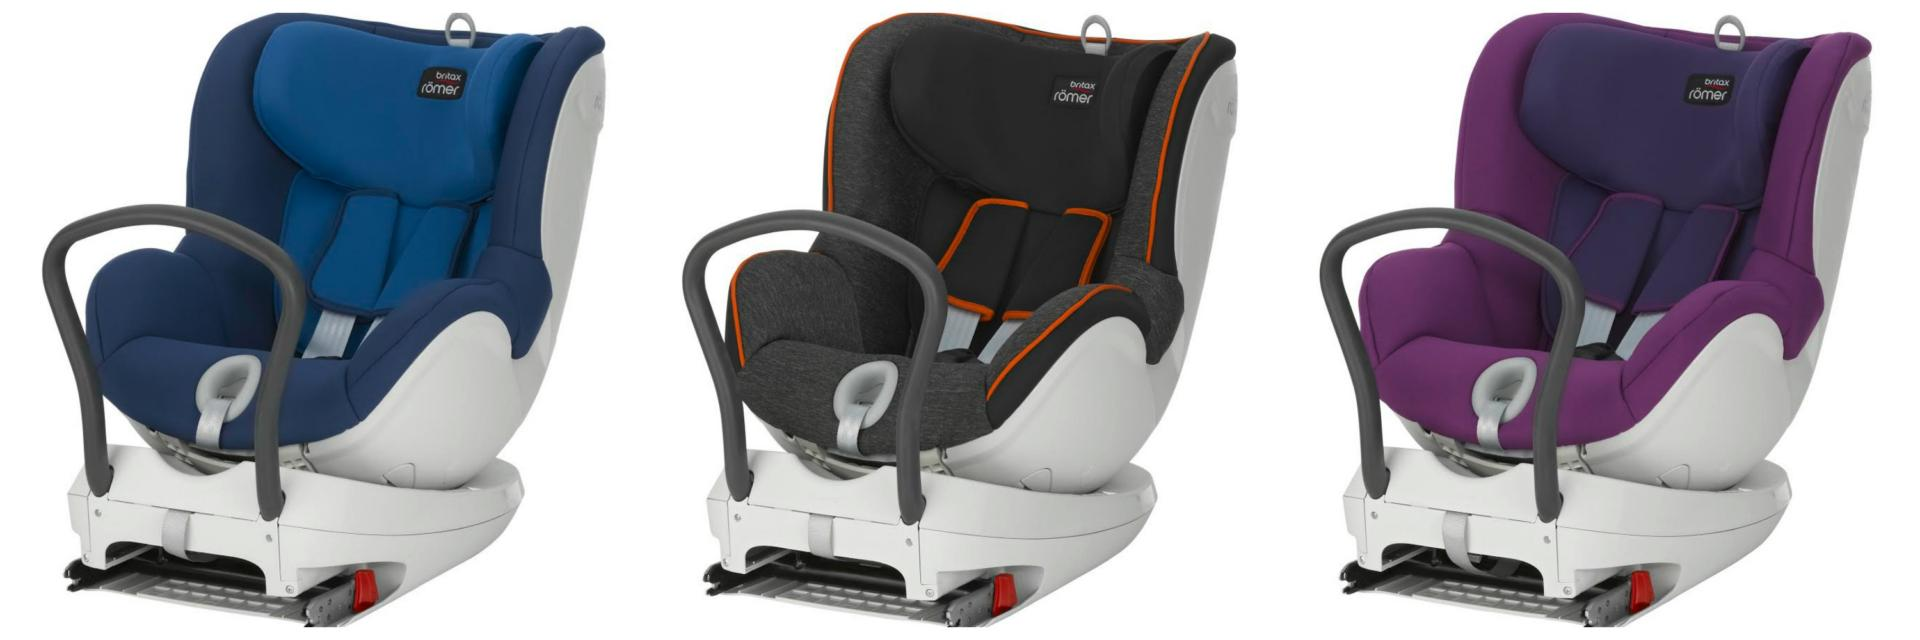 giveaway win a britax dualfix car seat family fever. Black Bedroom Furniture Sets. Home Design Ideas